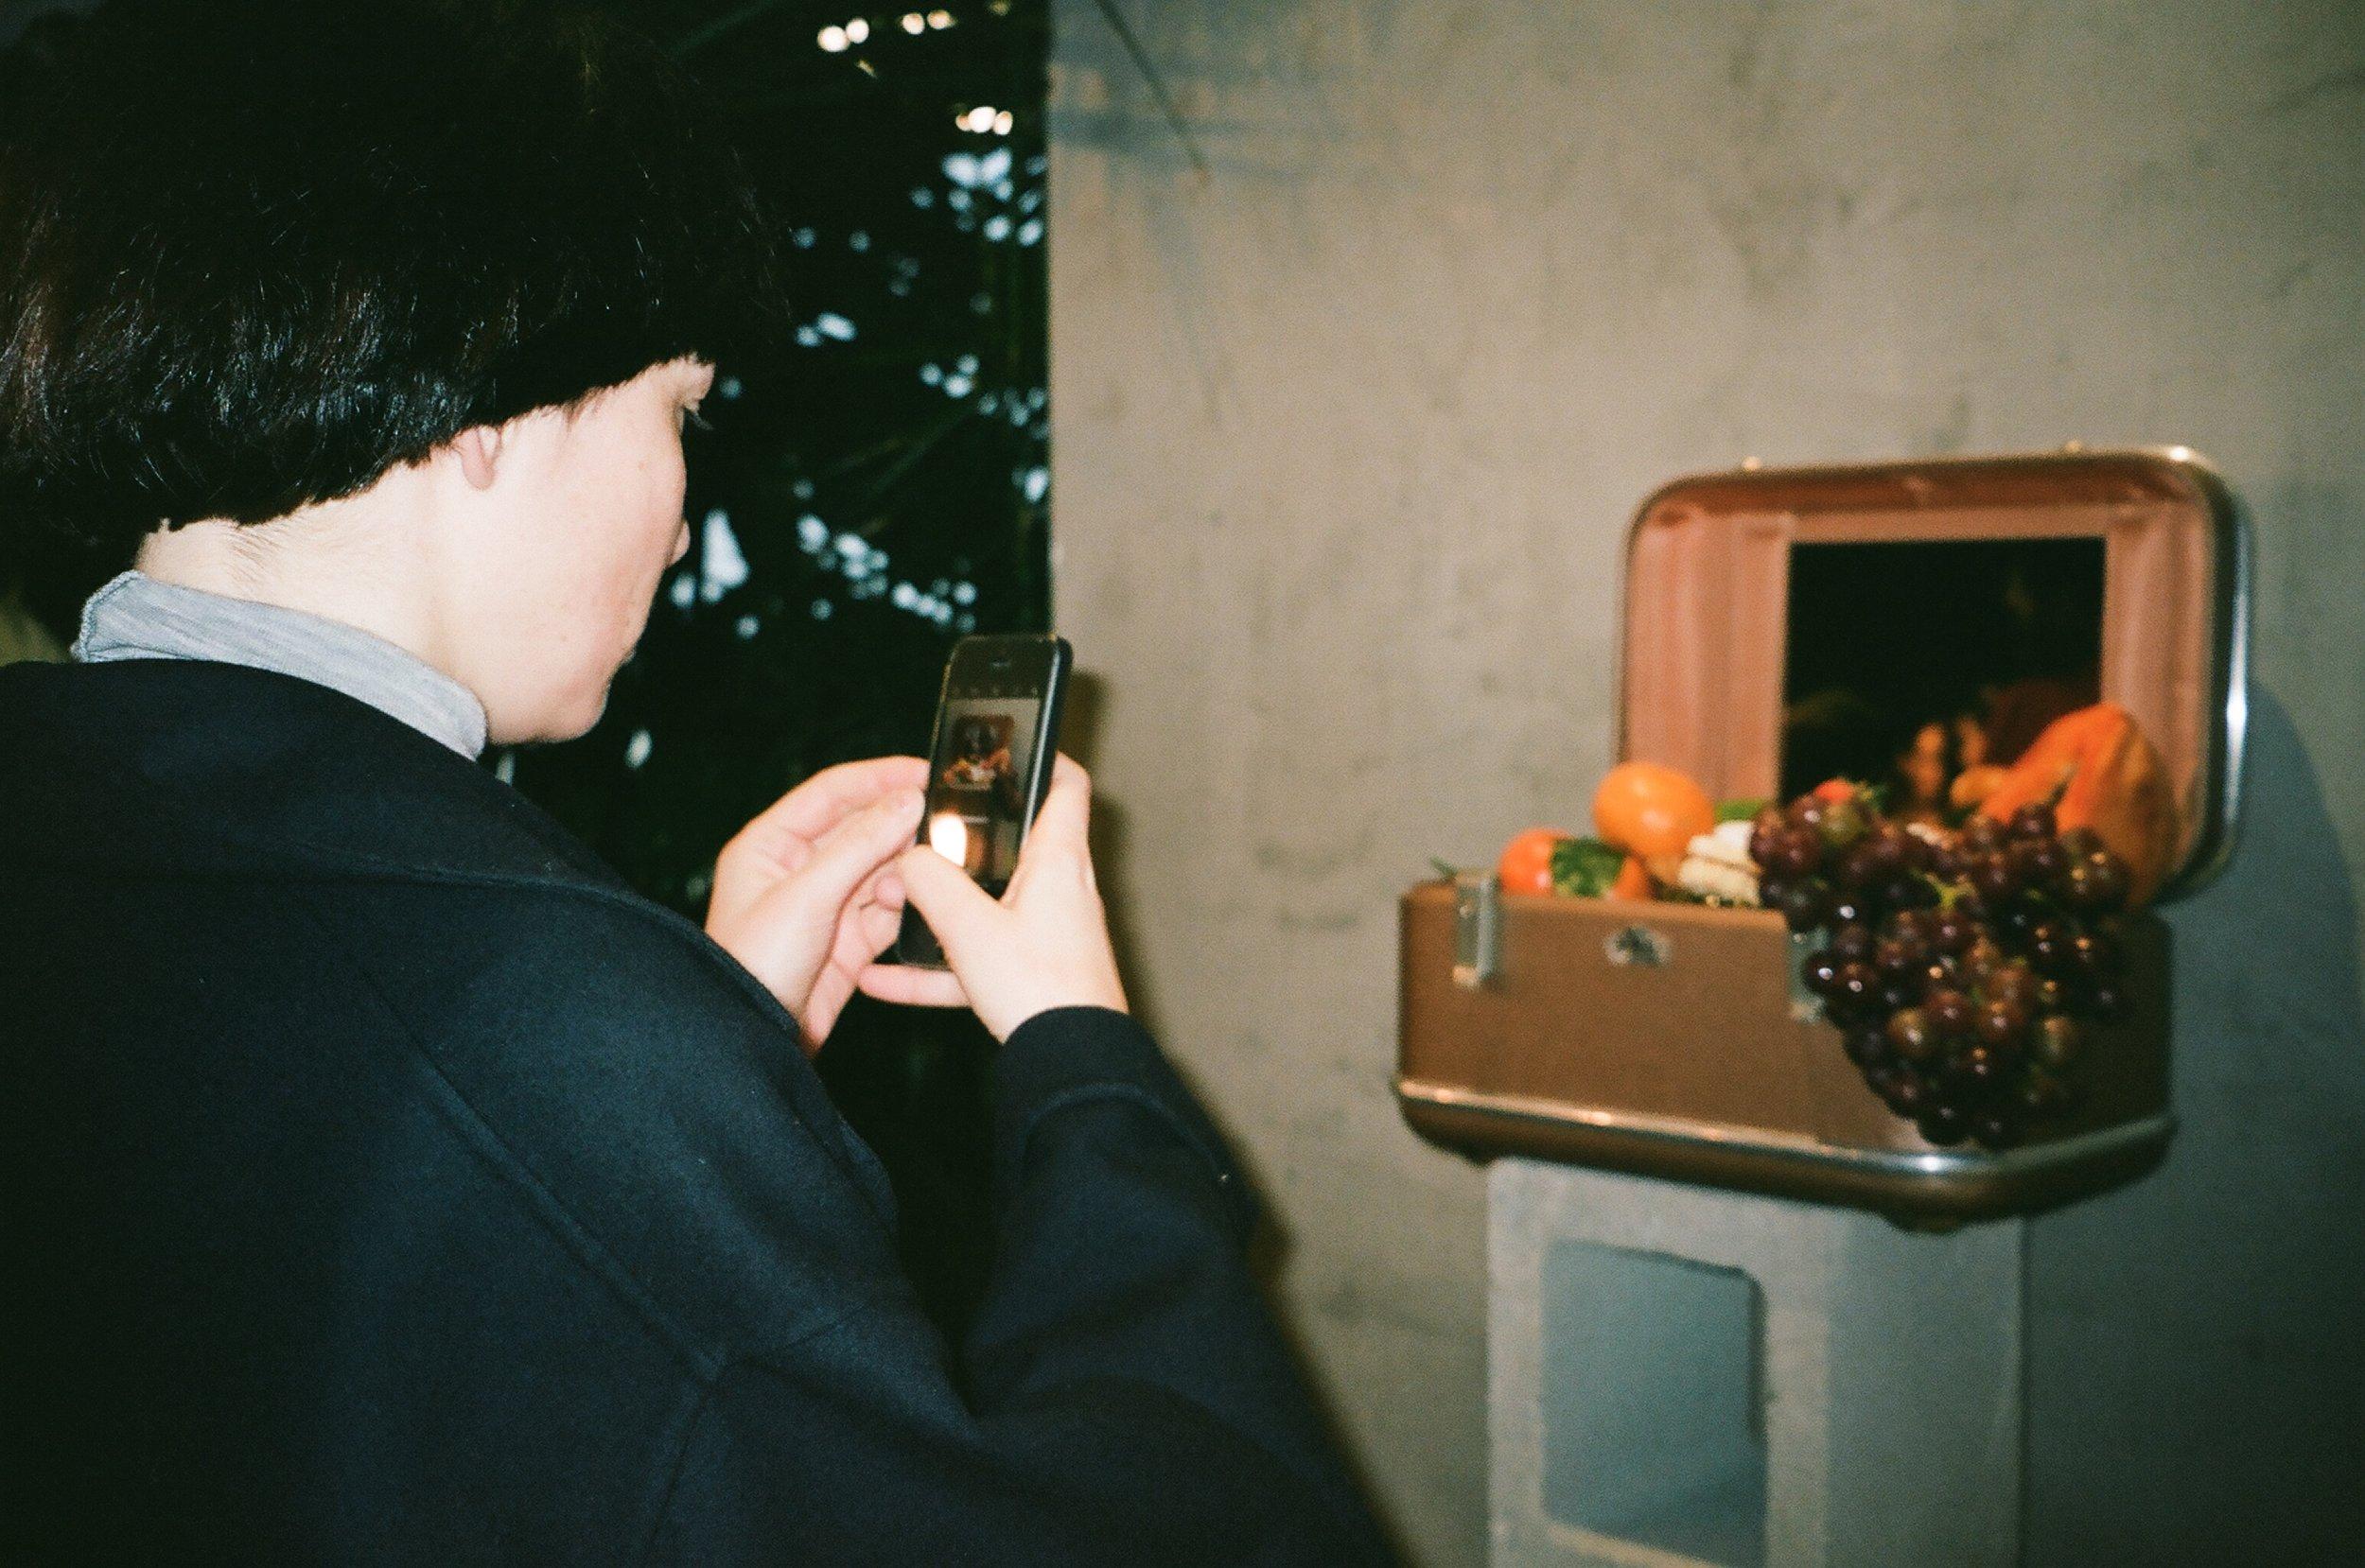 Photo by Kira Shipway